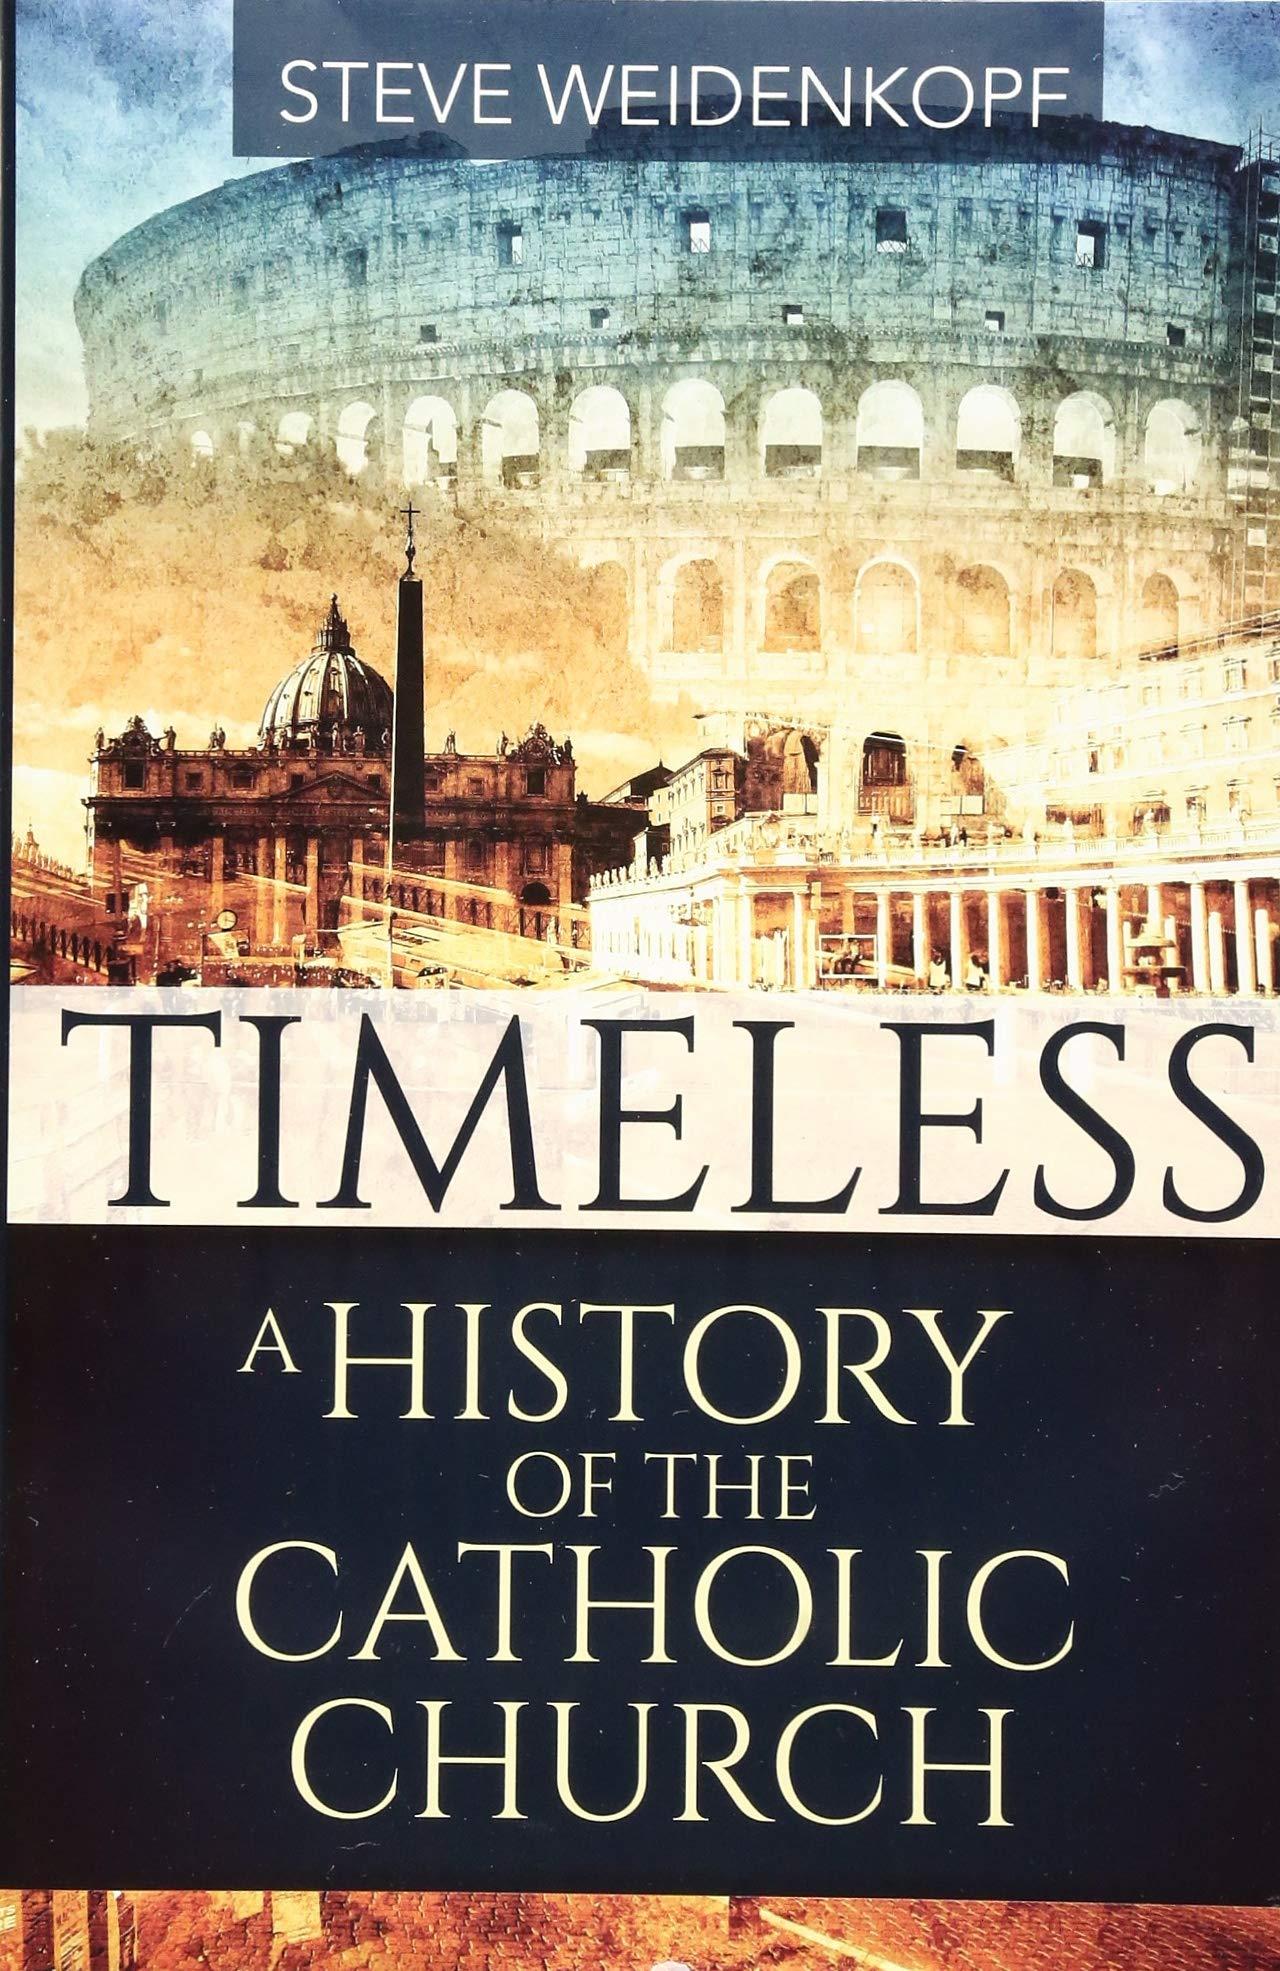 Timeless: A History of the Catholic Church: Steve Weidenkopf